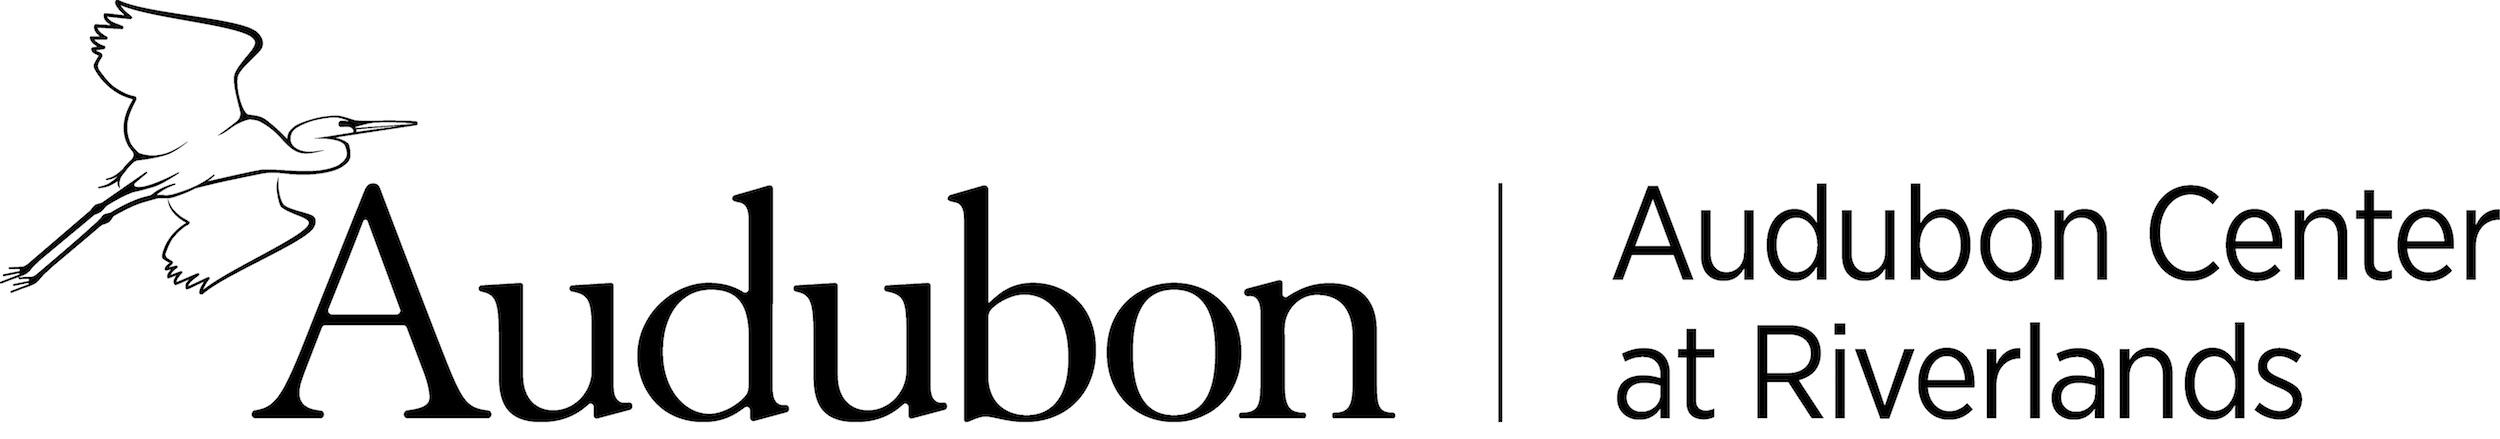 Audubon Riverlands logo